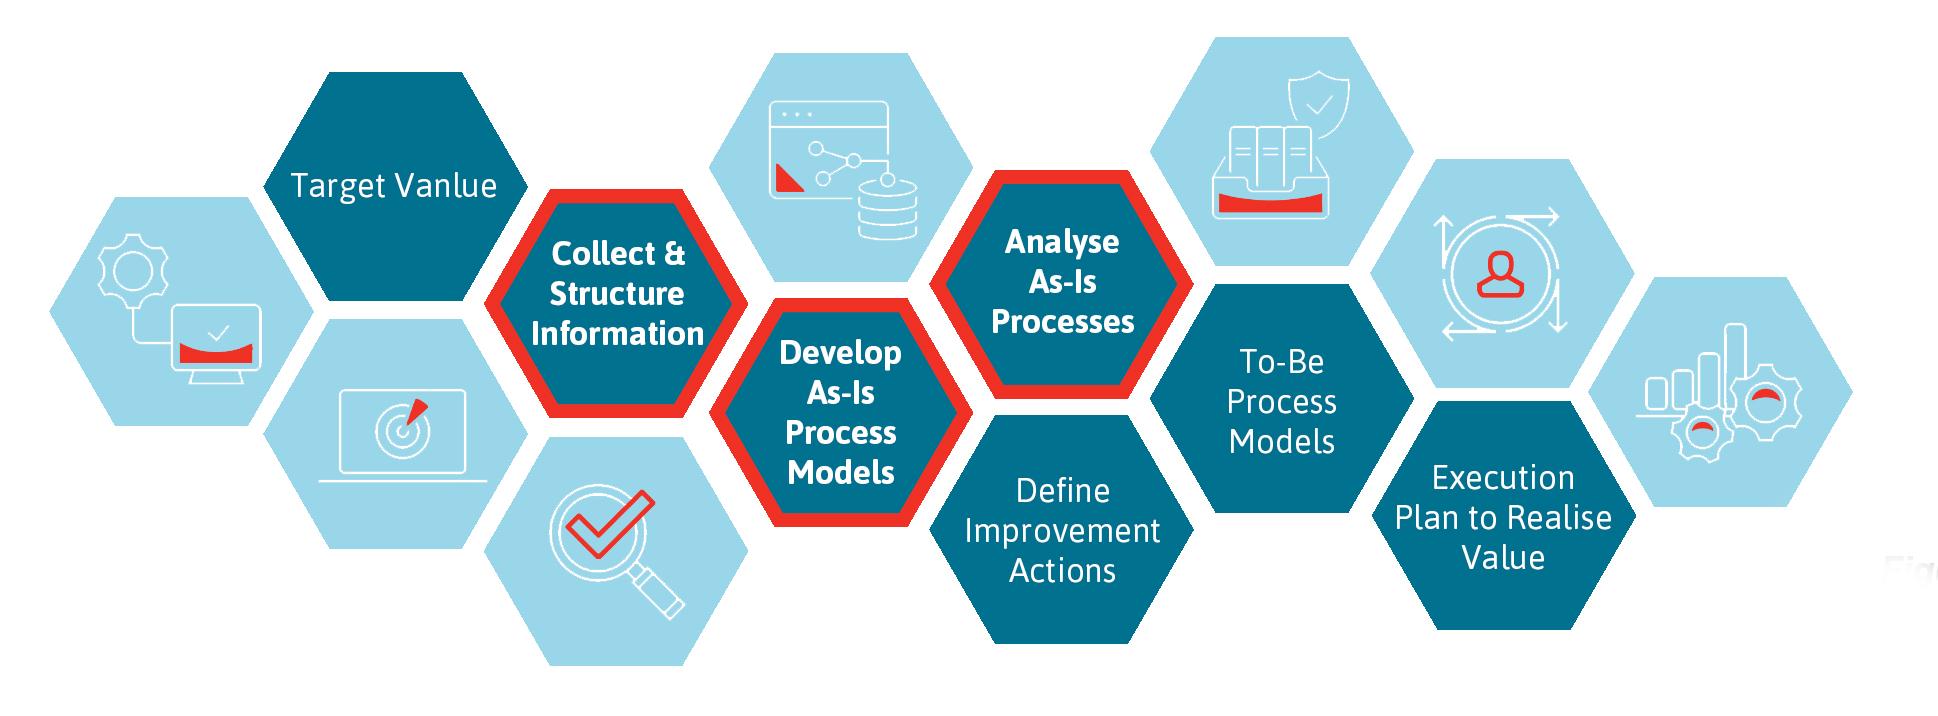 Rapid Process Improvement